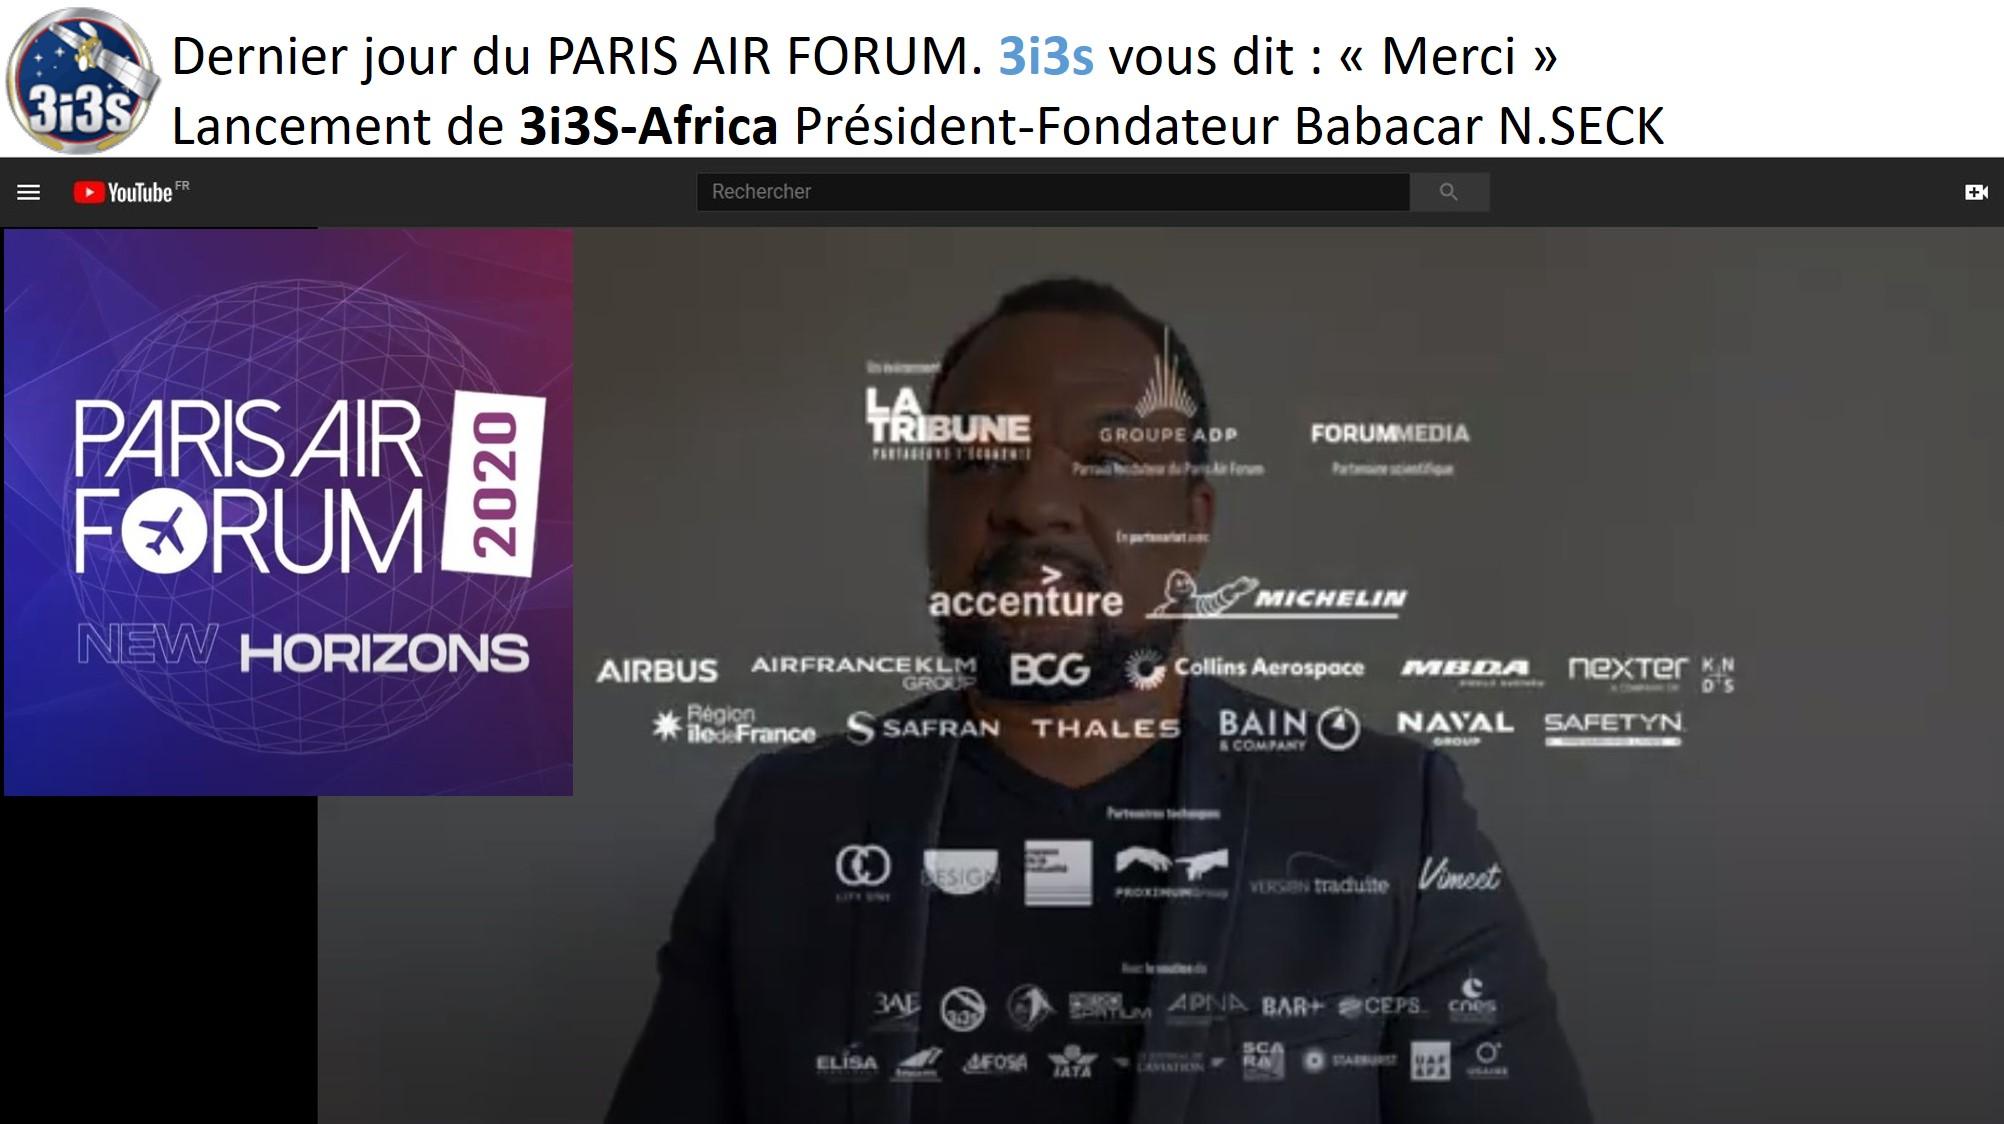 3i3s – PARIS AIR FORUM 7ème Edition Babacar N.SECK 3i3s Africa